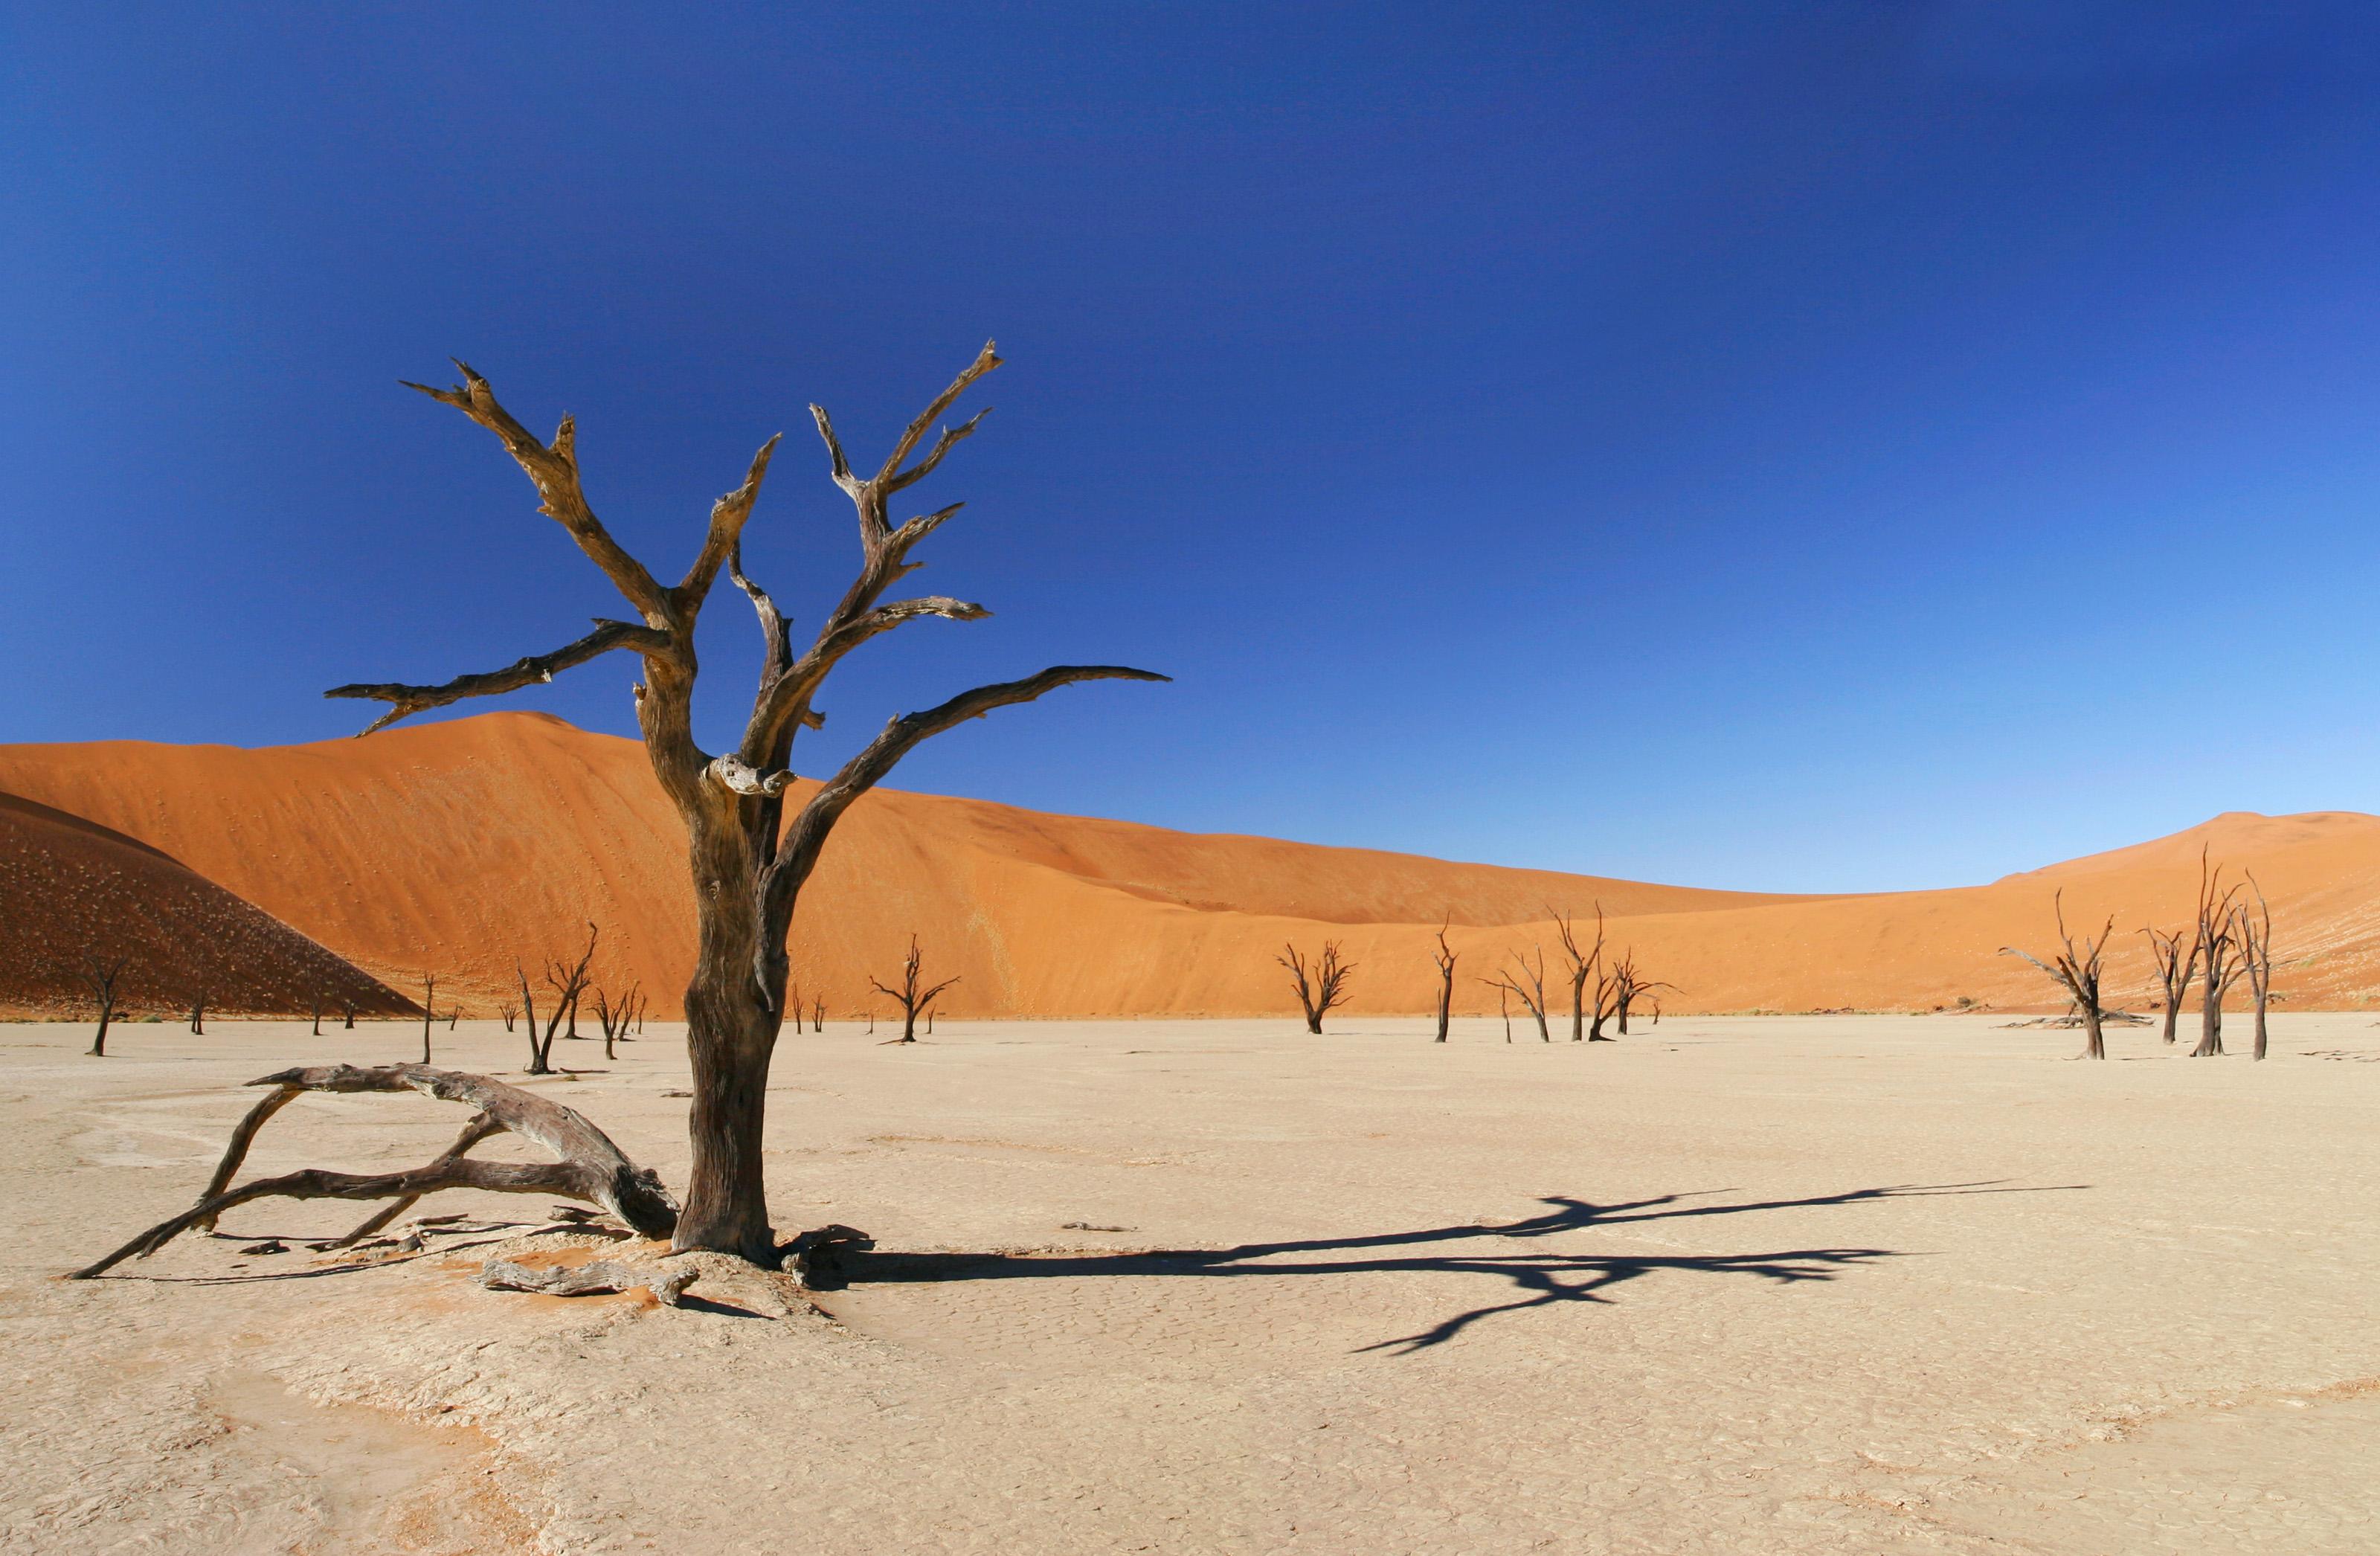 sivatagi_szaraz_fa.jpg